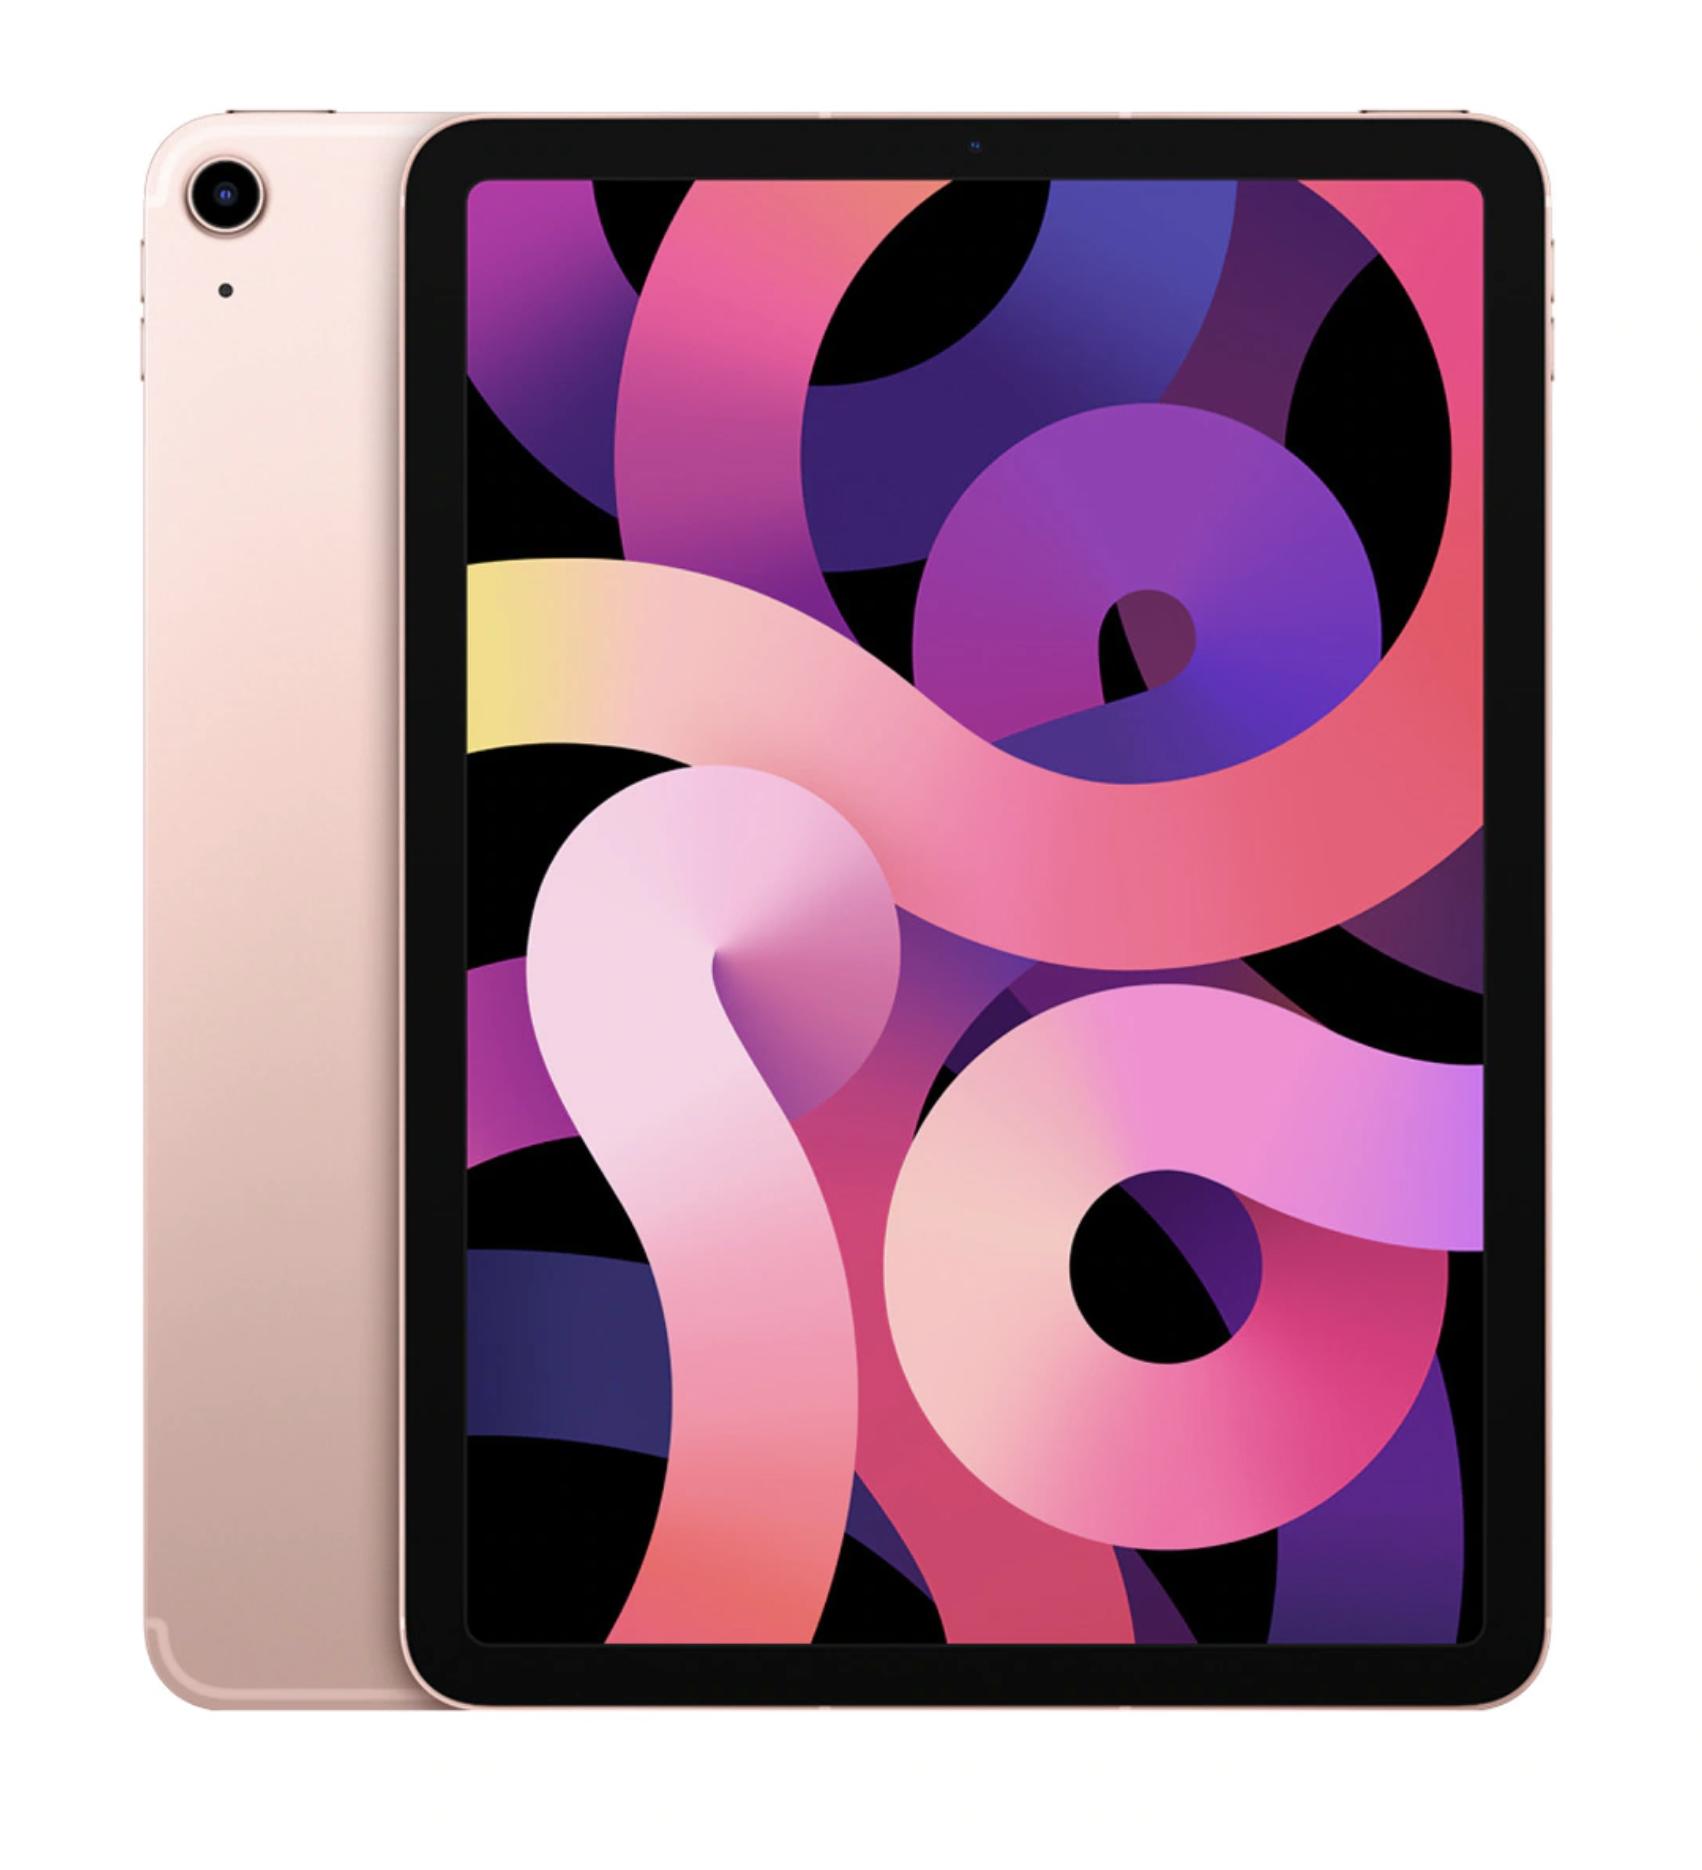 iPad Air 10.9 (2020) 256 GB Wi-Fi + Cellular Oro rosa